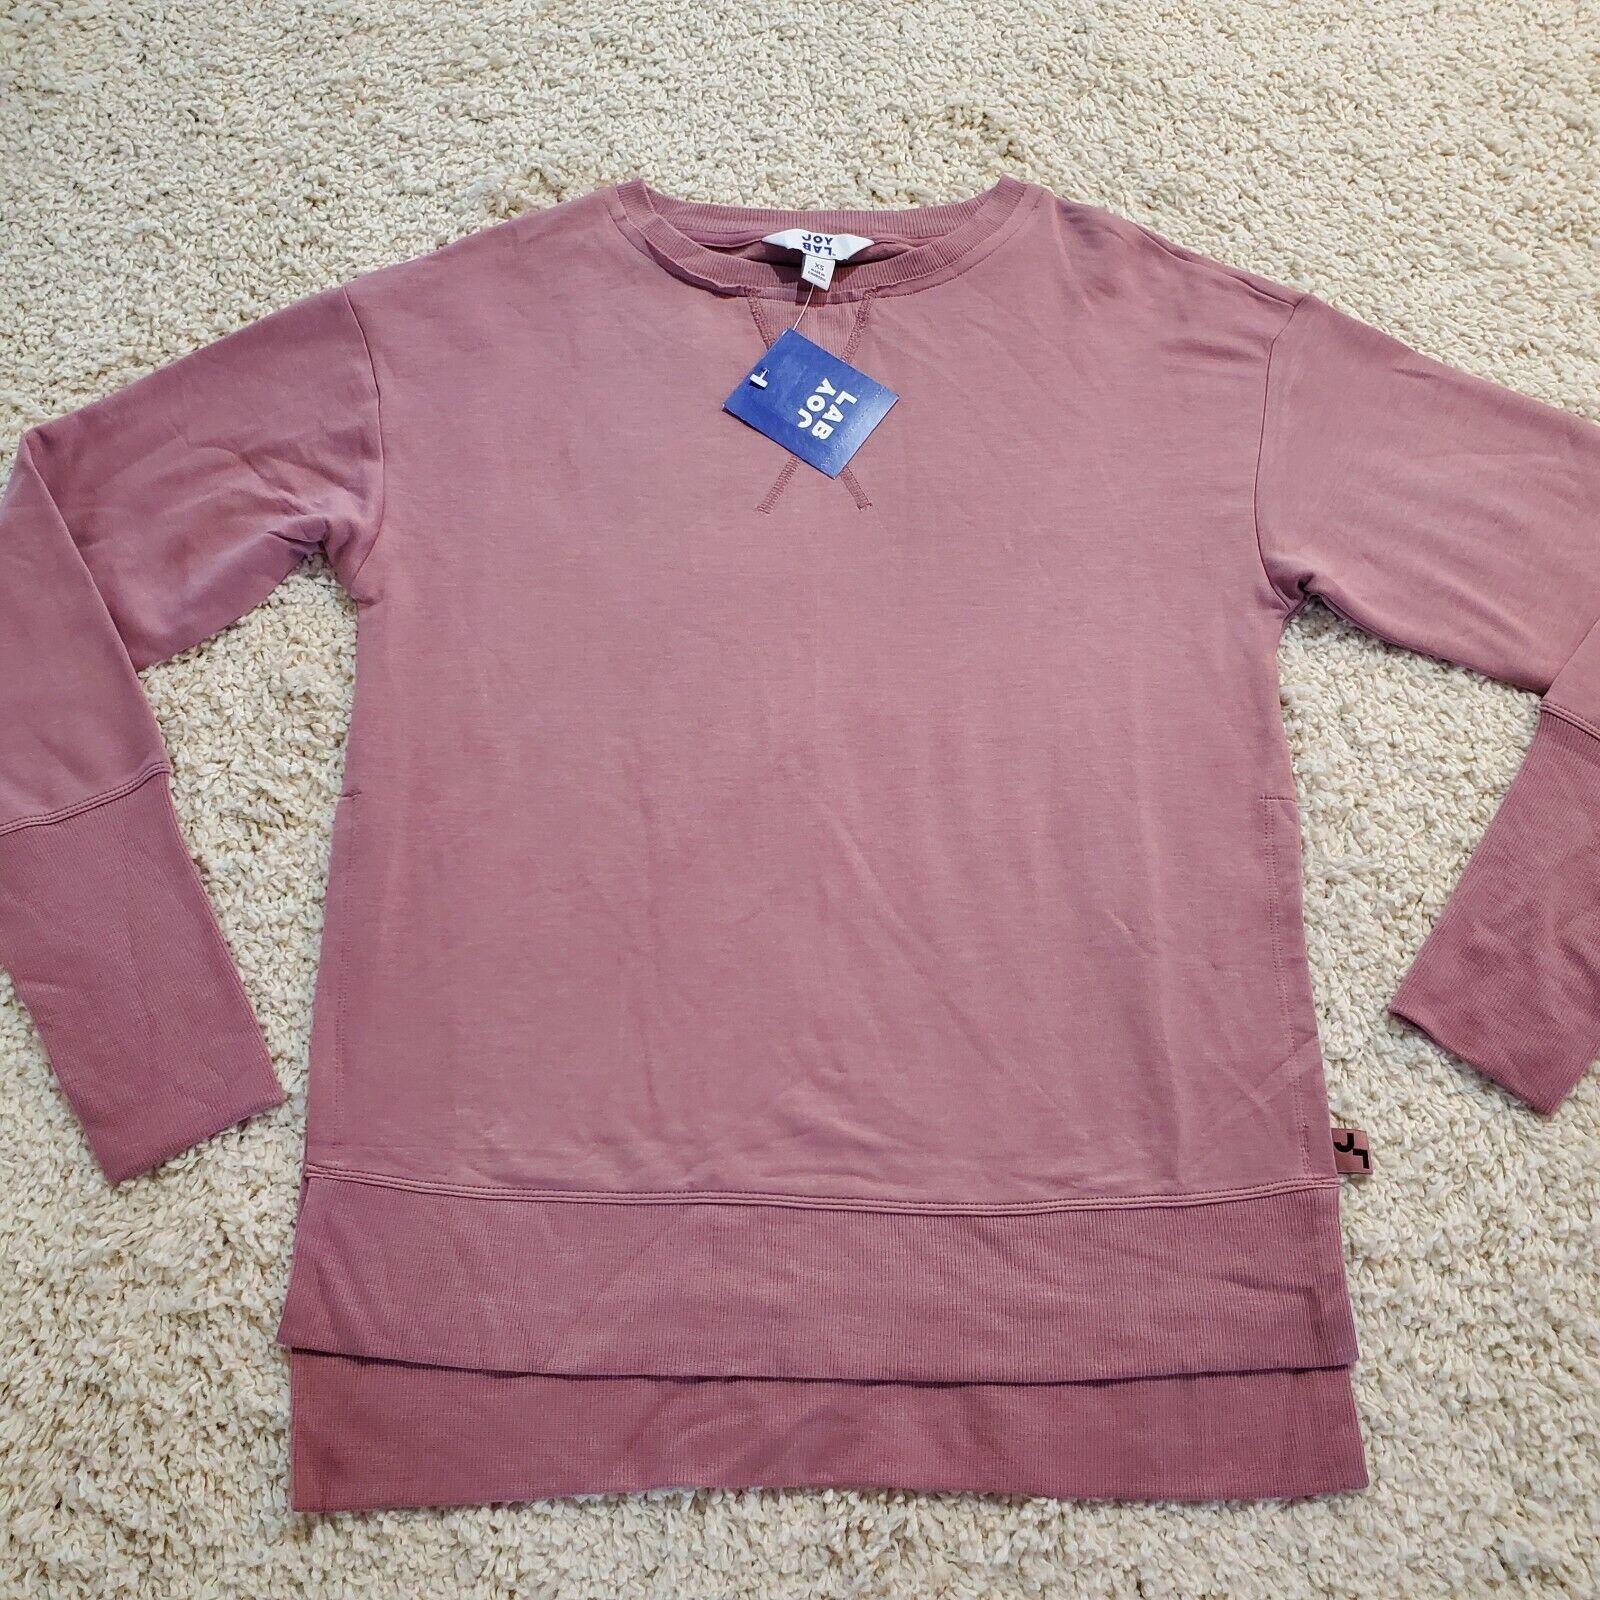 JoyLab Women's Cozy Side Slit Pullover Sweatshirt Rose XS JoyLab Pink Pullover